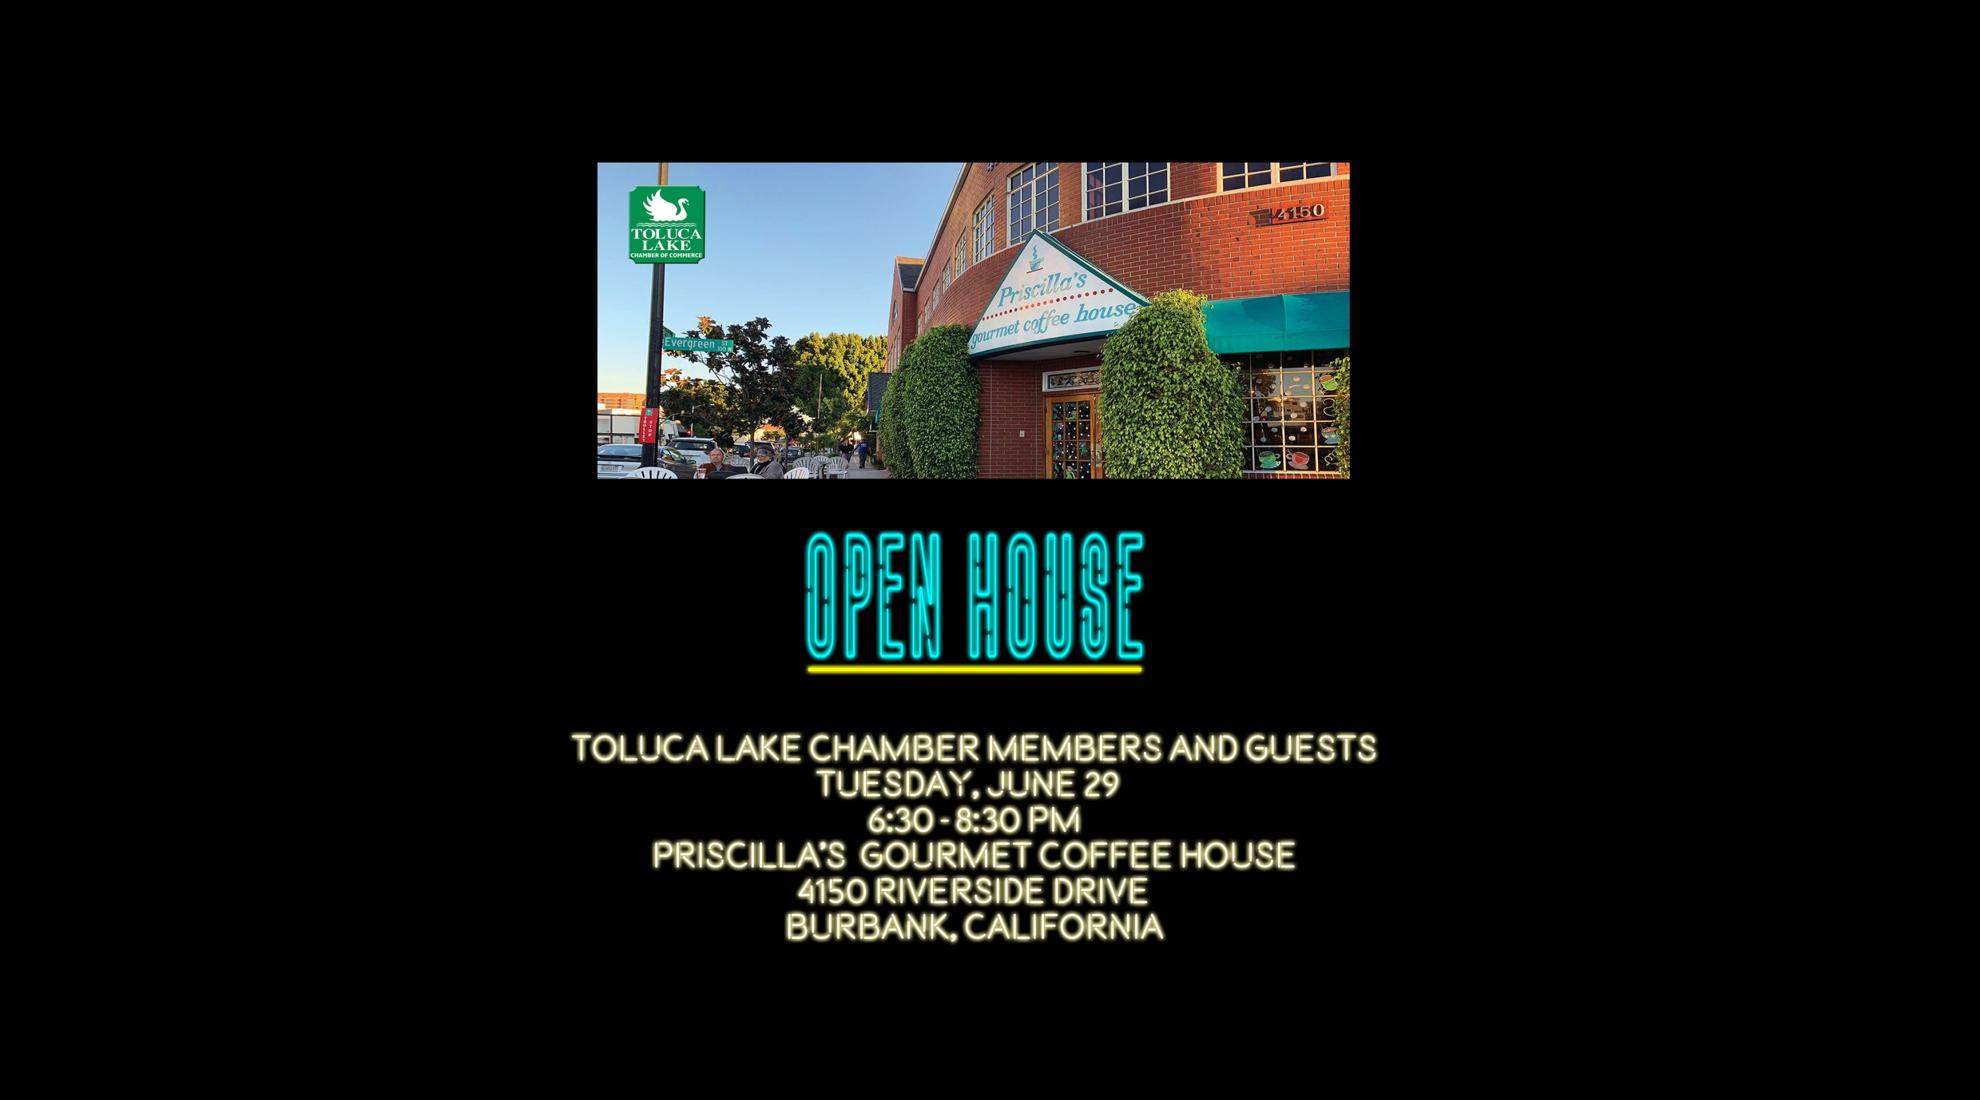 TLC_flyer_open_house_priscillas_6-29-2021_v2